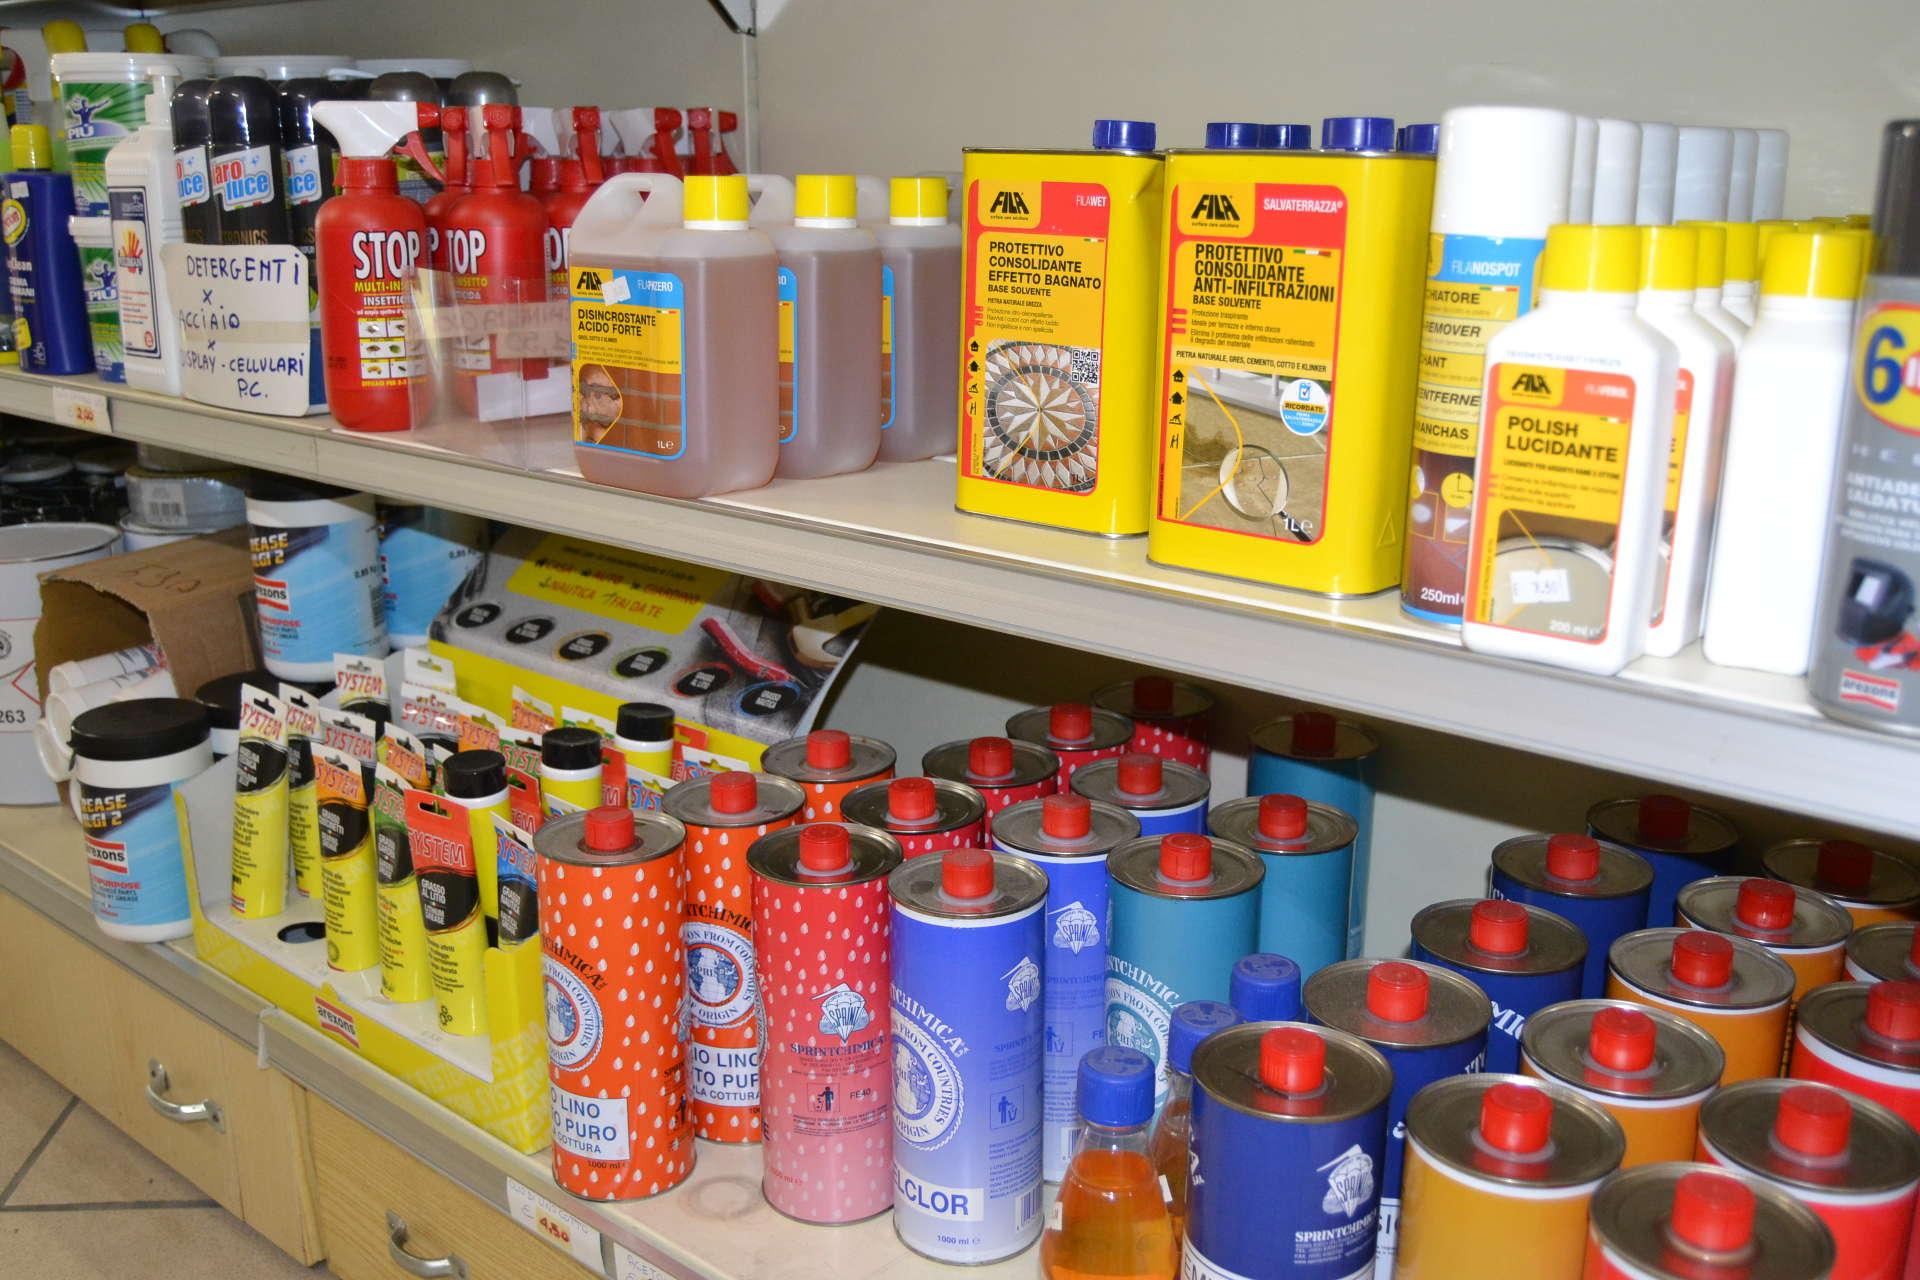 Detergenti detersivi antimuffa